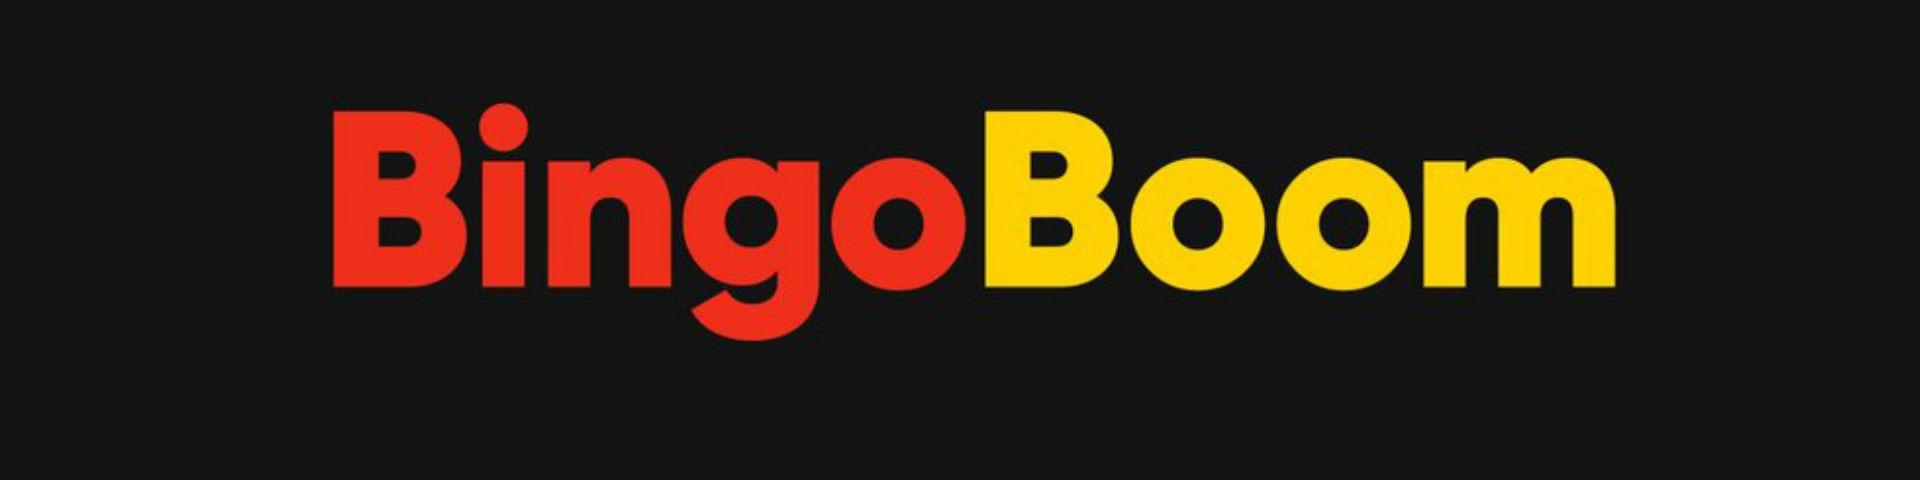 Реклама БК BingoBoom в «Яндекс.Поиске» признана незаконной